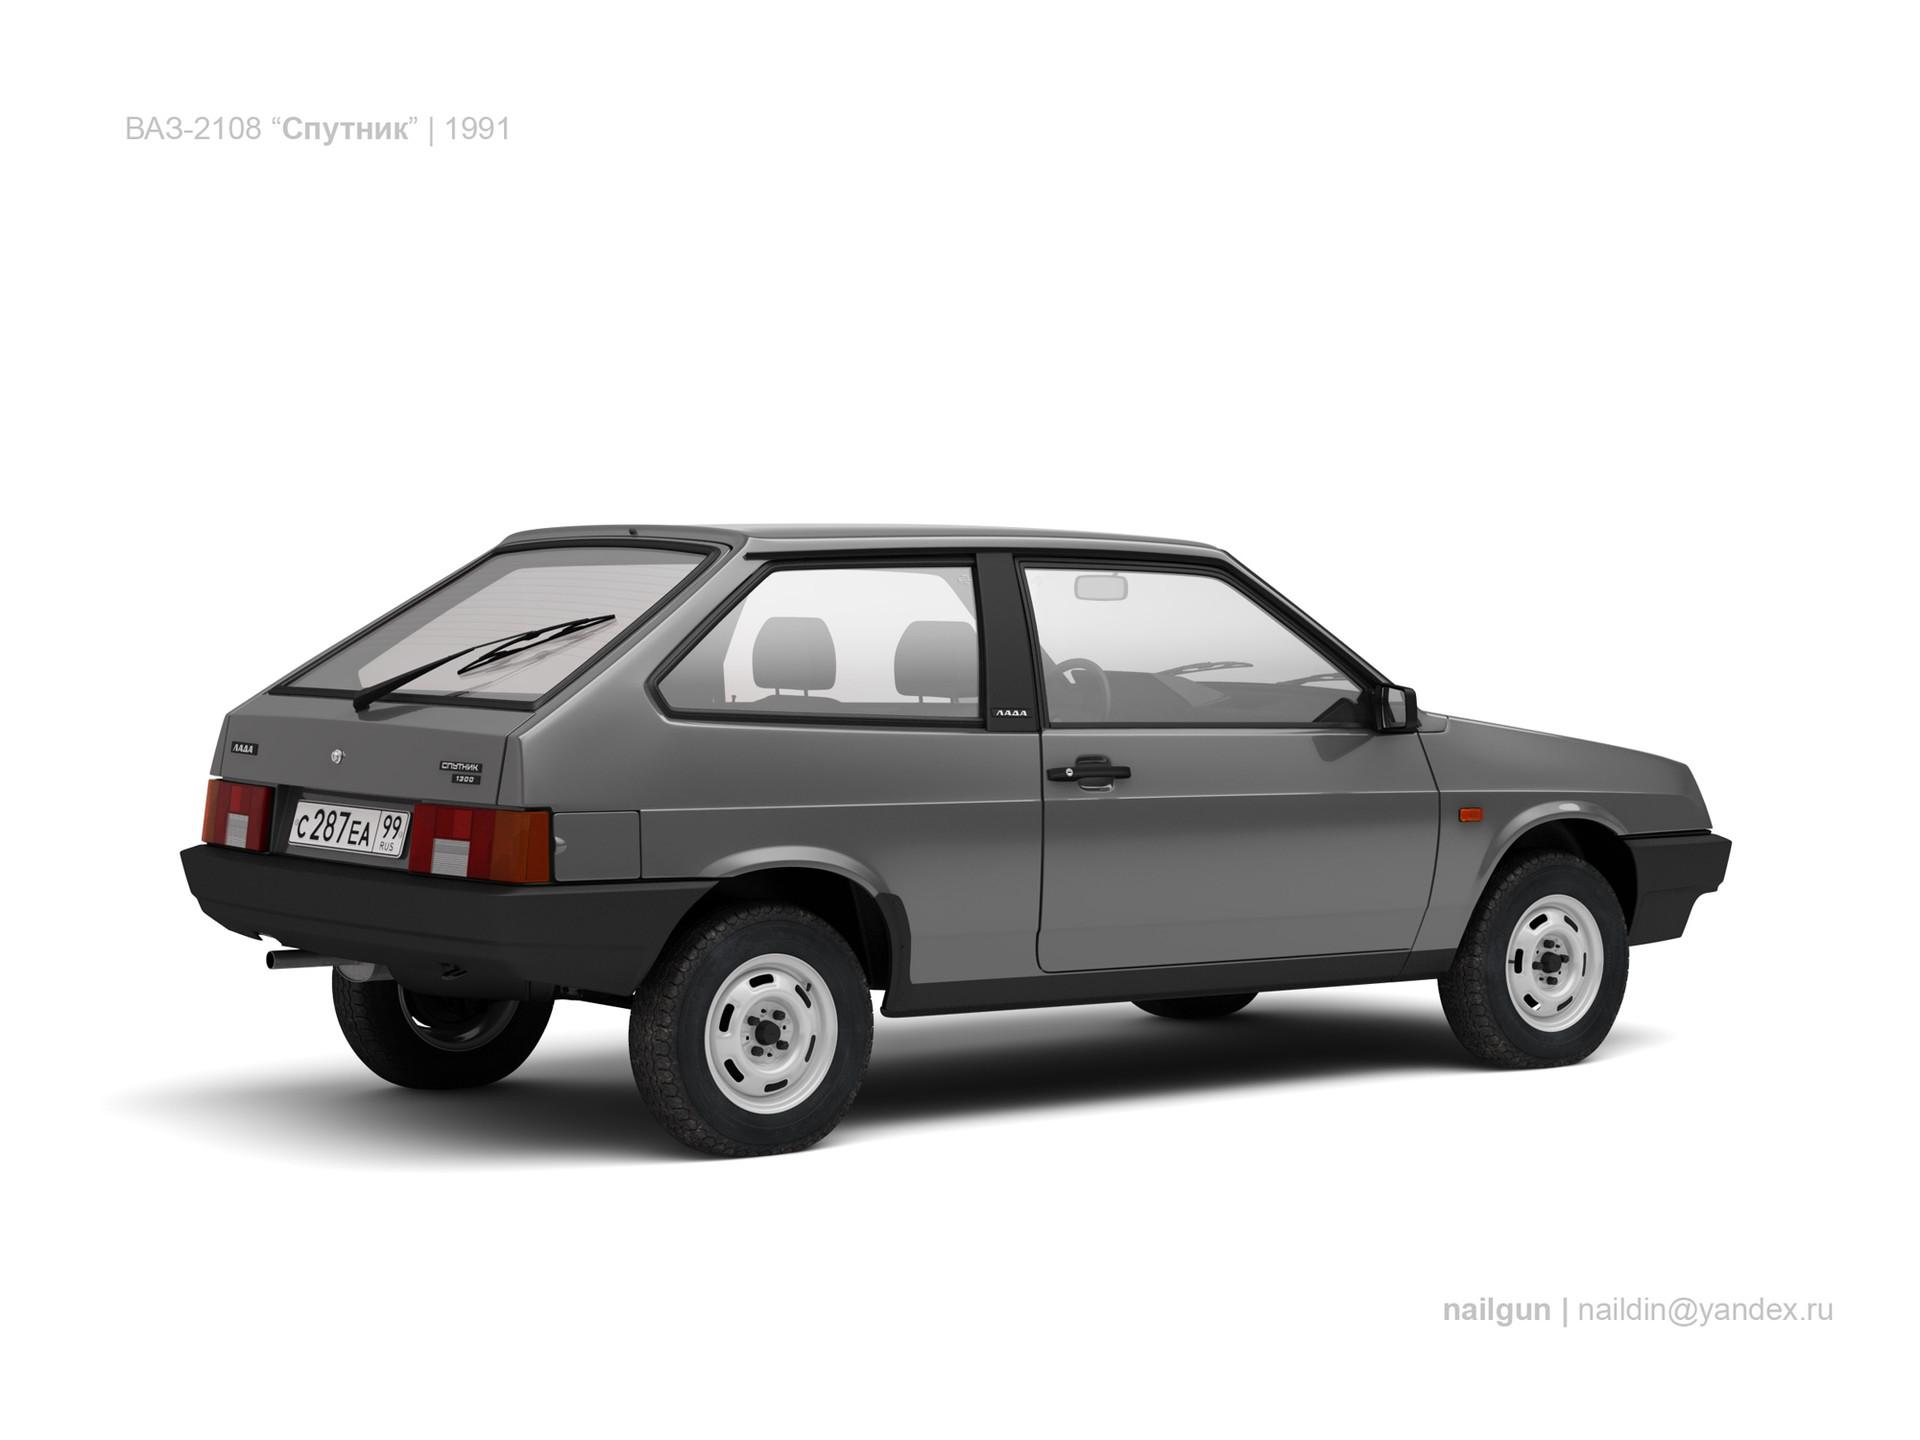 Nail khusnutdinov sw vaz 2108 1990 longwing 1